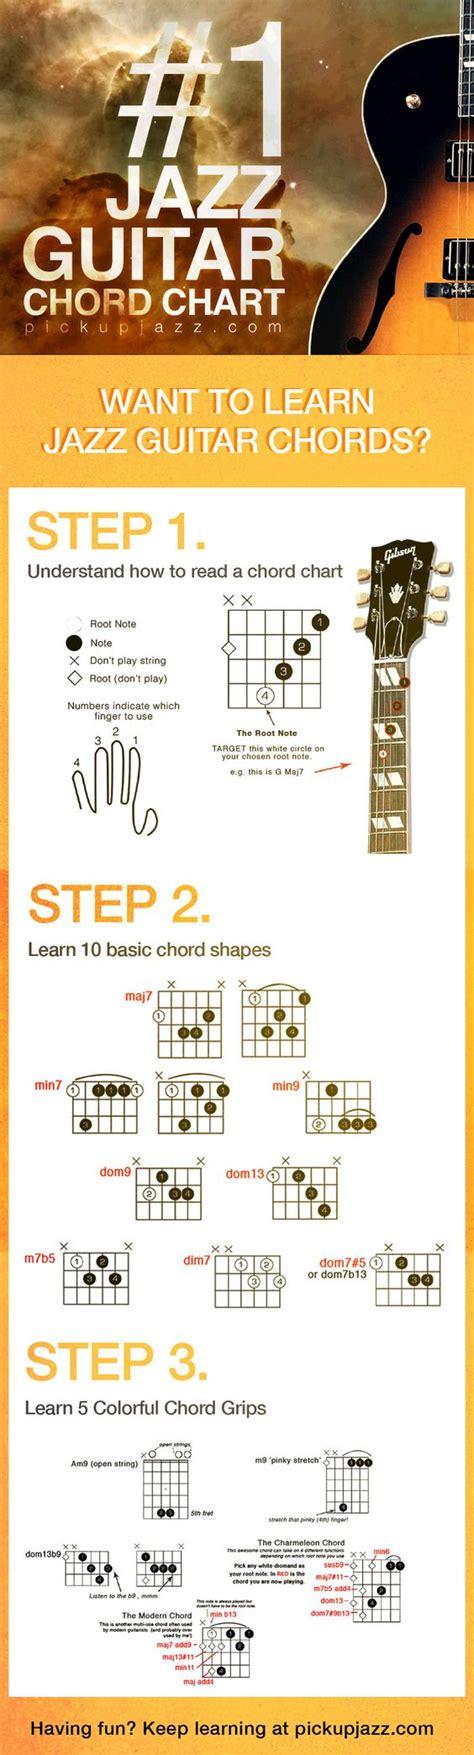 tutorial gitar jazz prinsip dasar belajar kunci gitar jazz yang harus dipahami